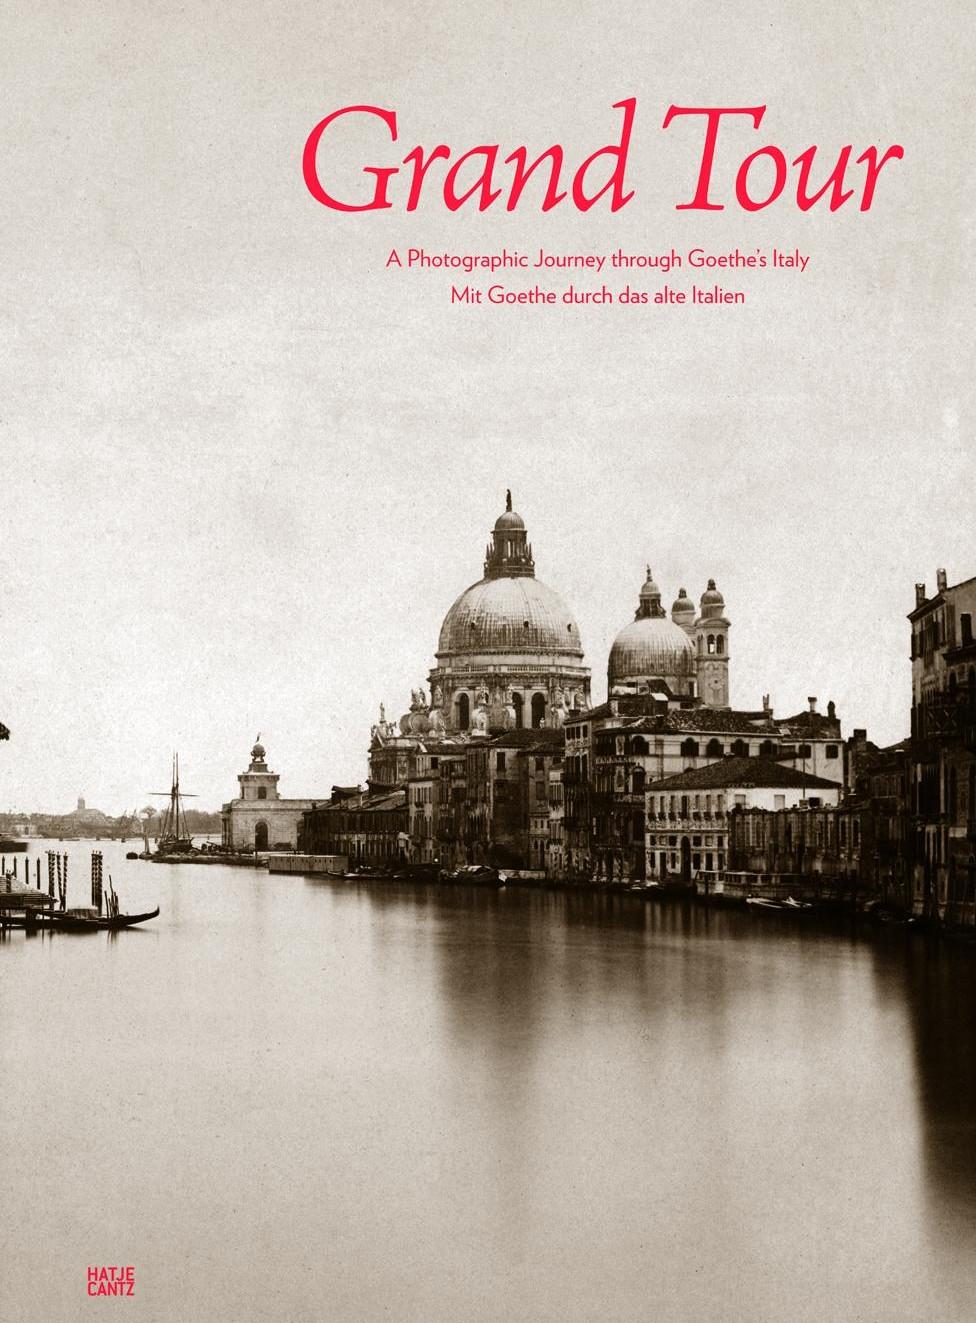 Grand Tour - Mit Goethe durch das alte Italien/圖片來源:Hatje Cantz 官方網頁